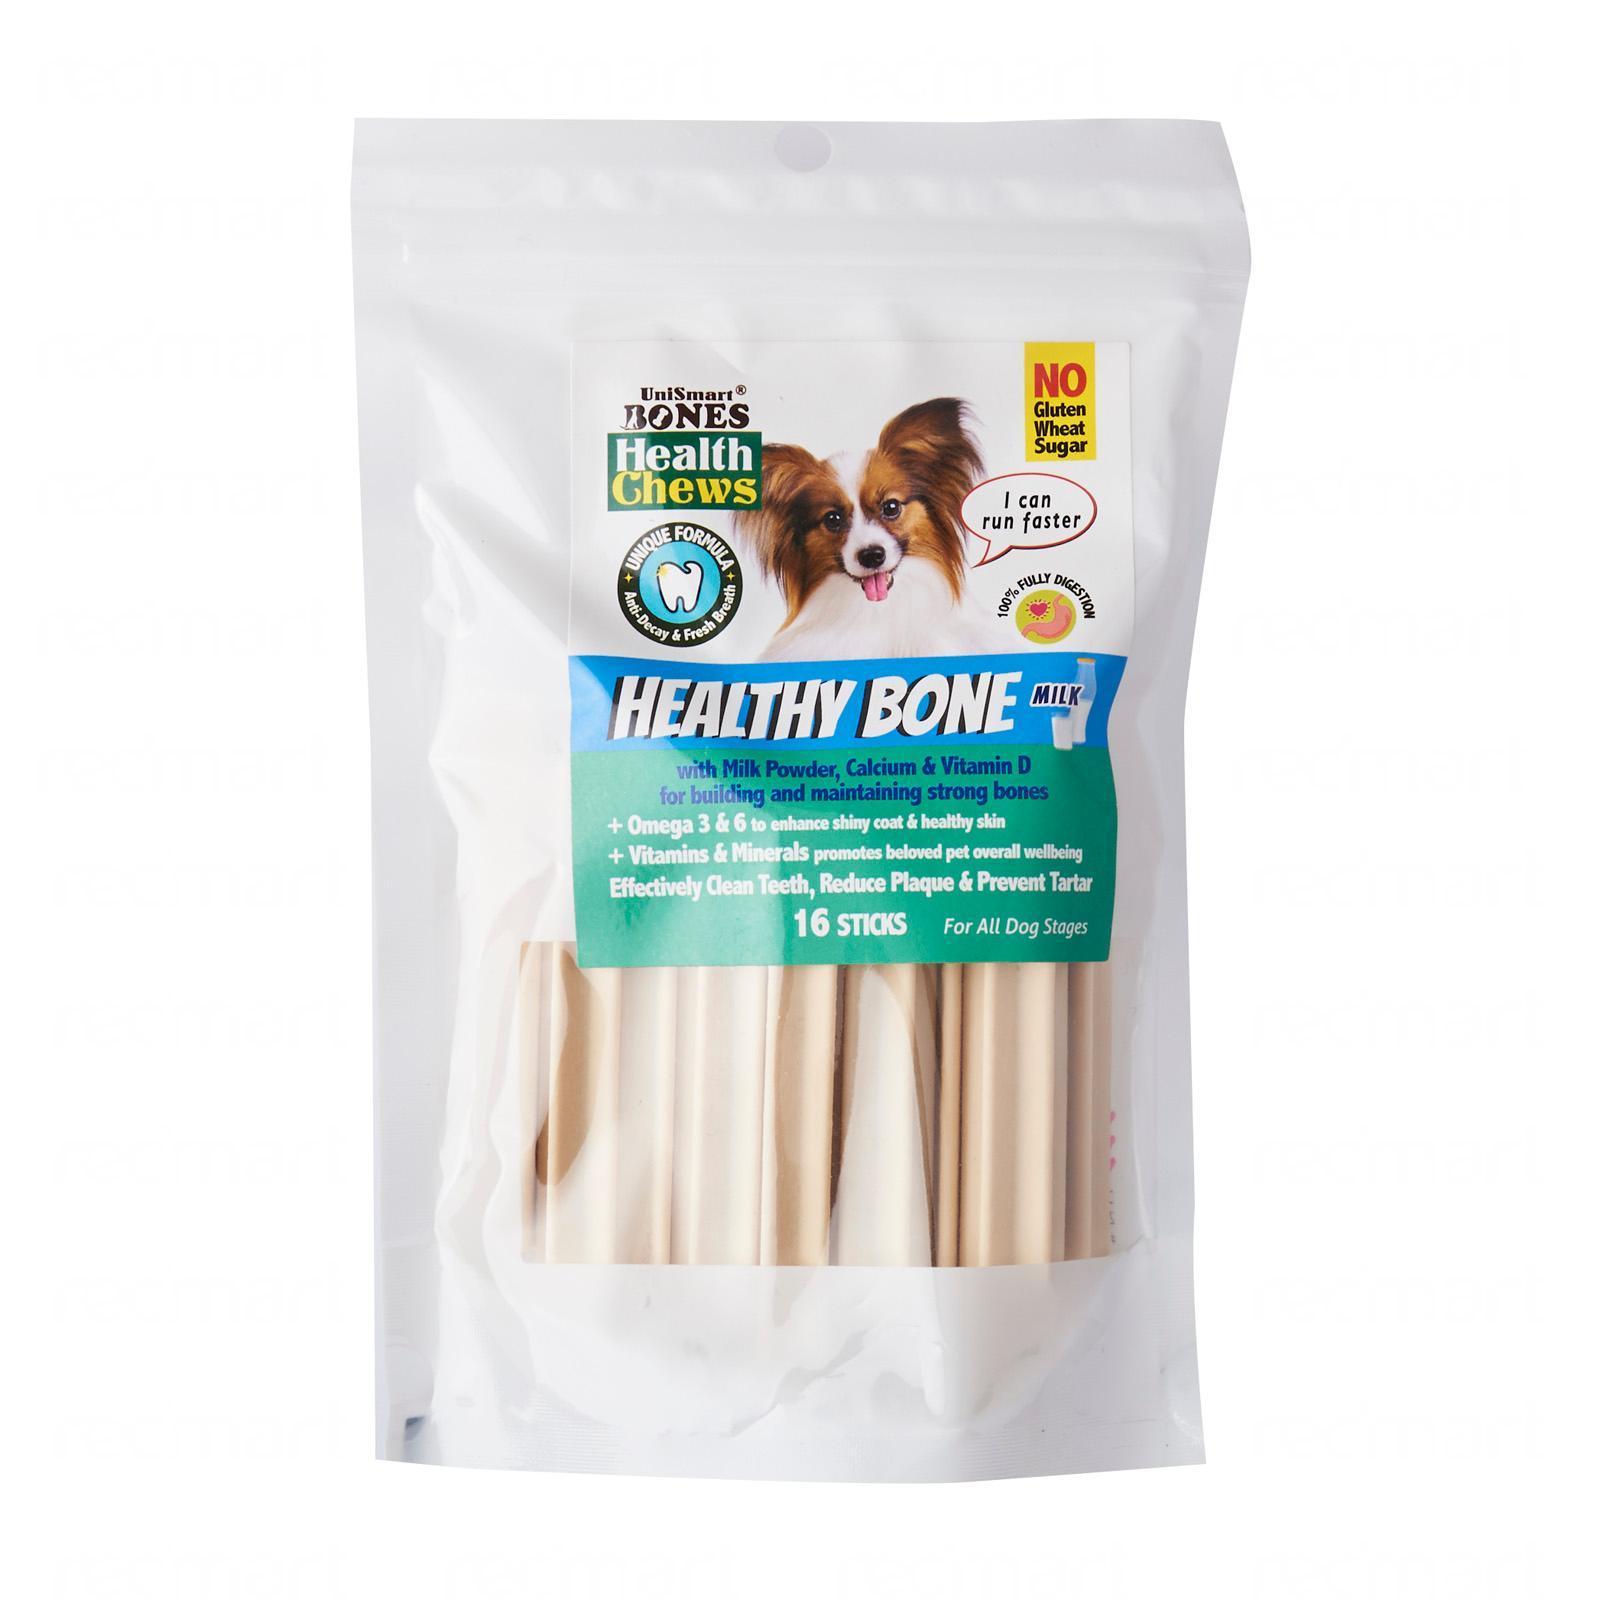 Unismart Bones Health Chews Healthy Bone - Milk